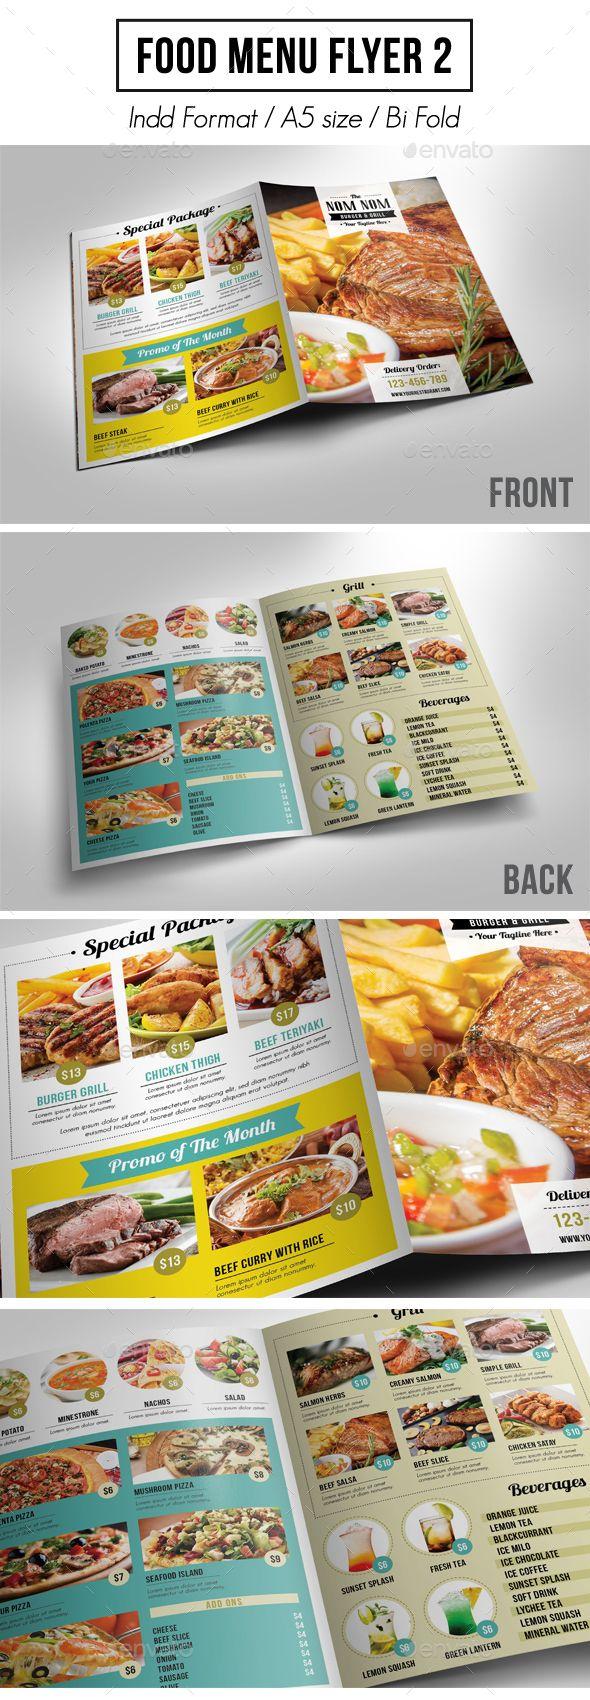 Food poster restaurant templates 24x36